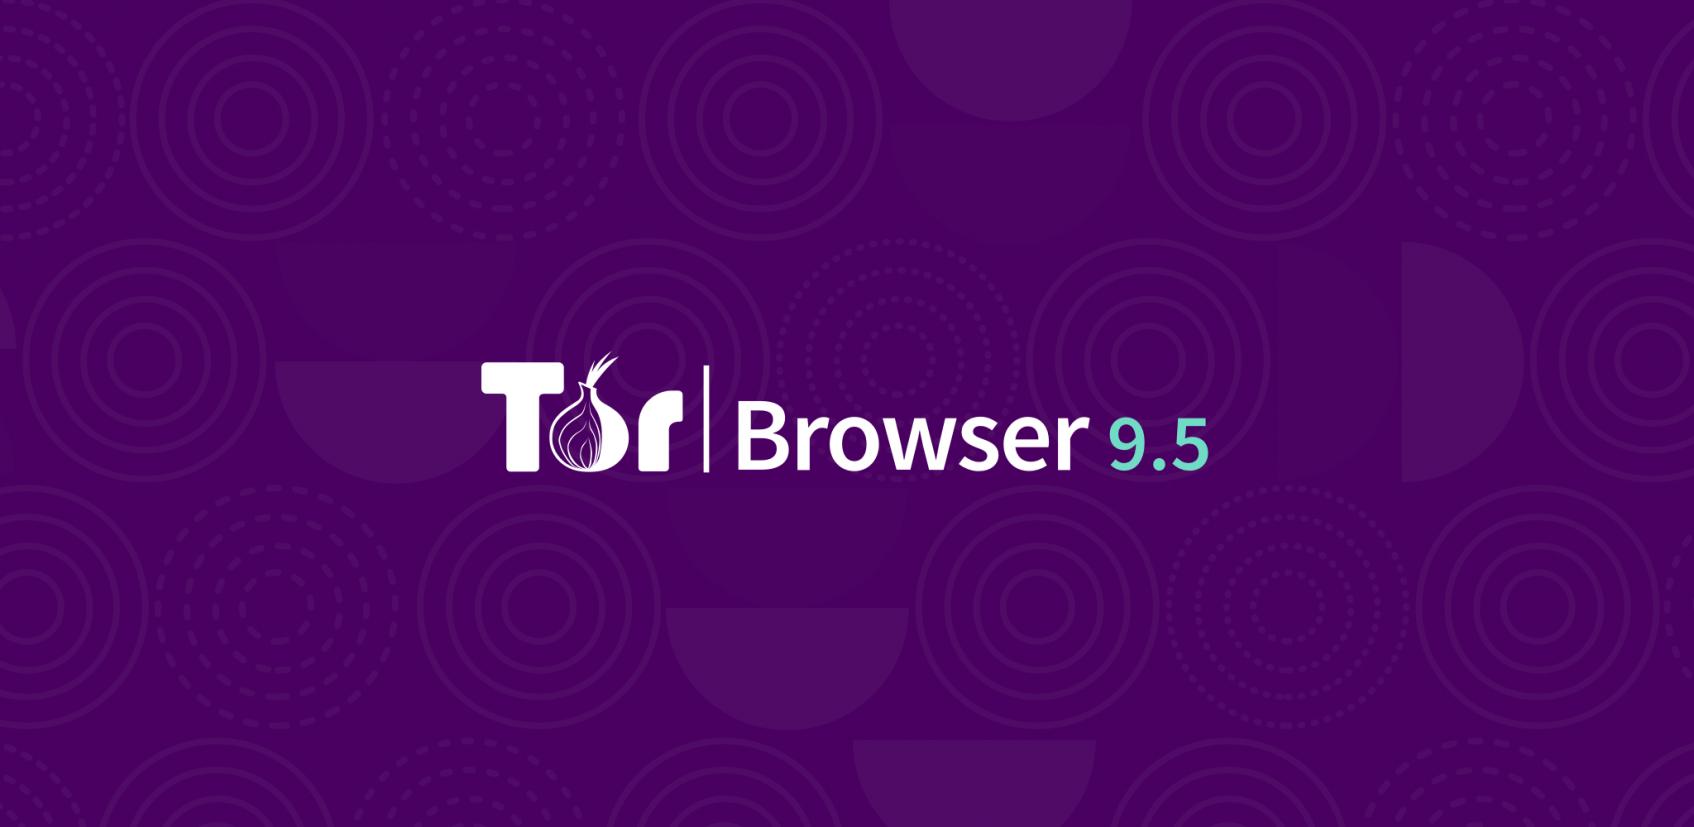 Доступен Tor Browser 9.5